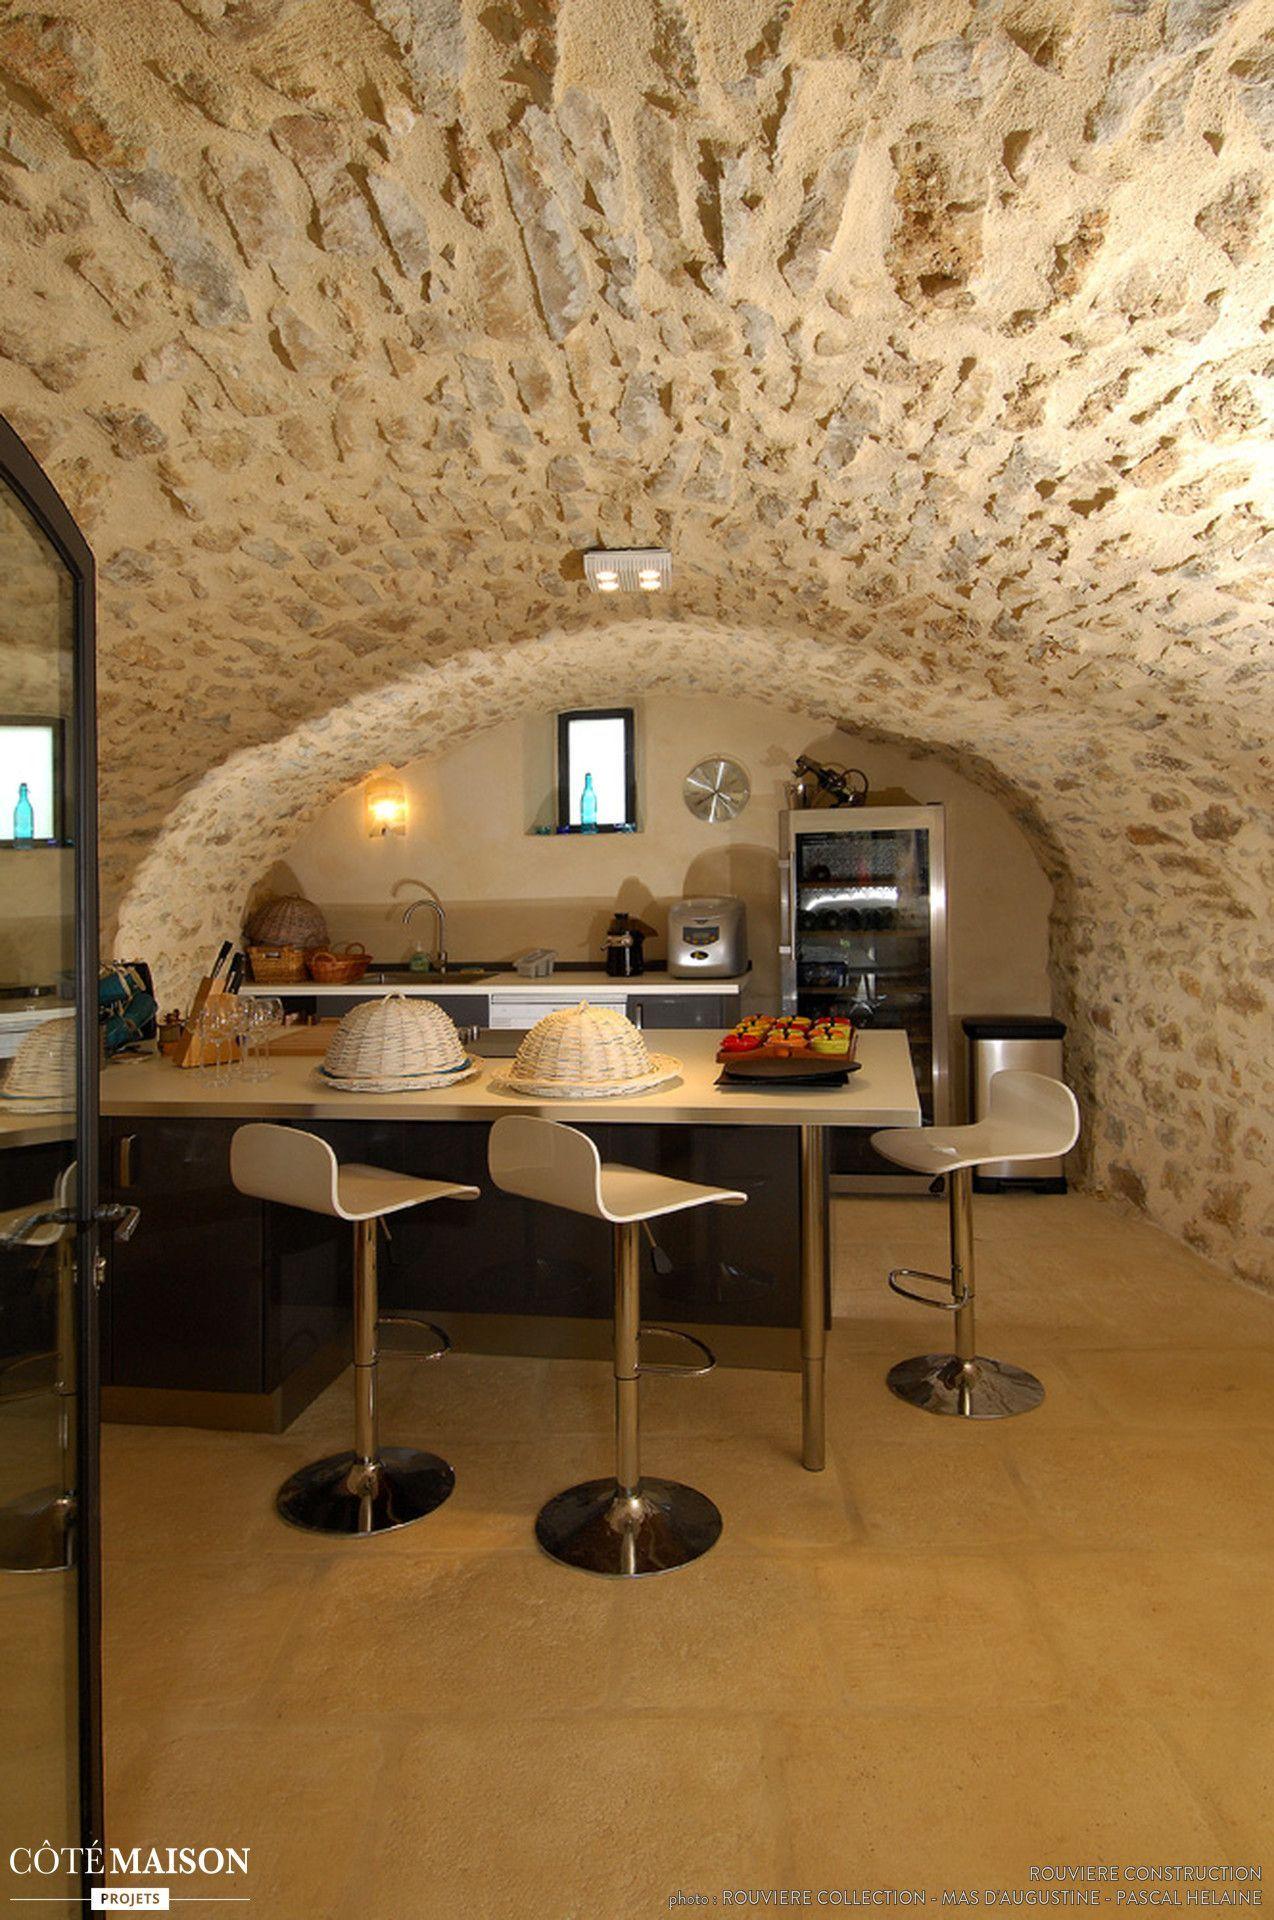 Une Cuisine Sous Une Voute Home Wine Cellars Basement Remodeling Rustic Modern Kitchen